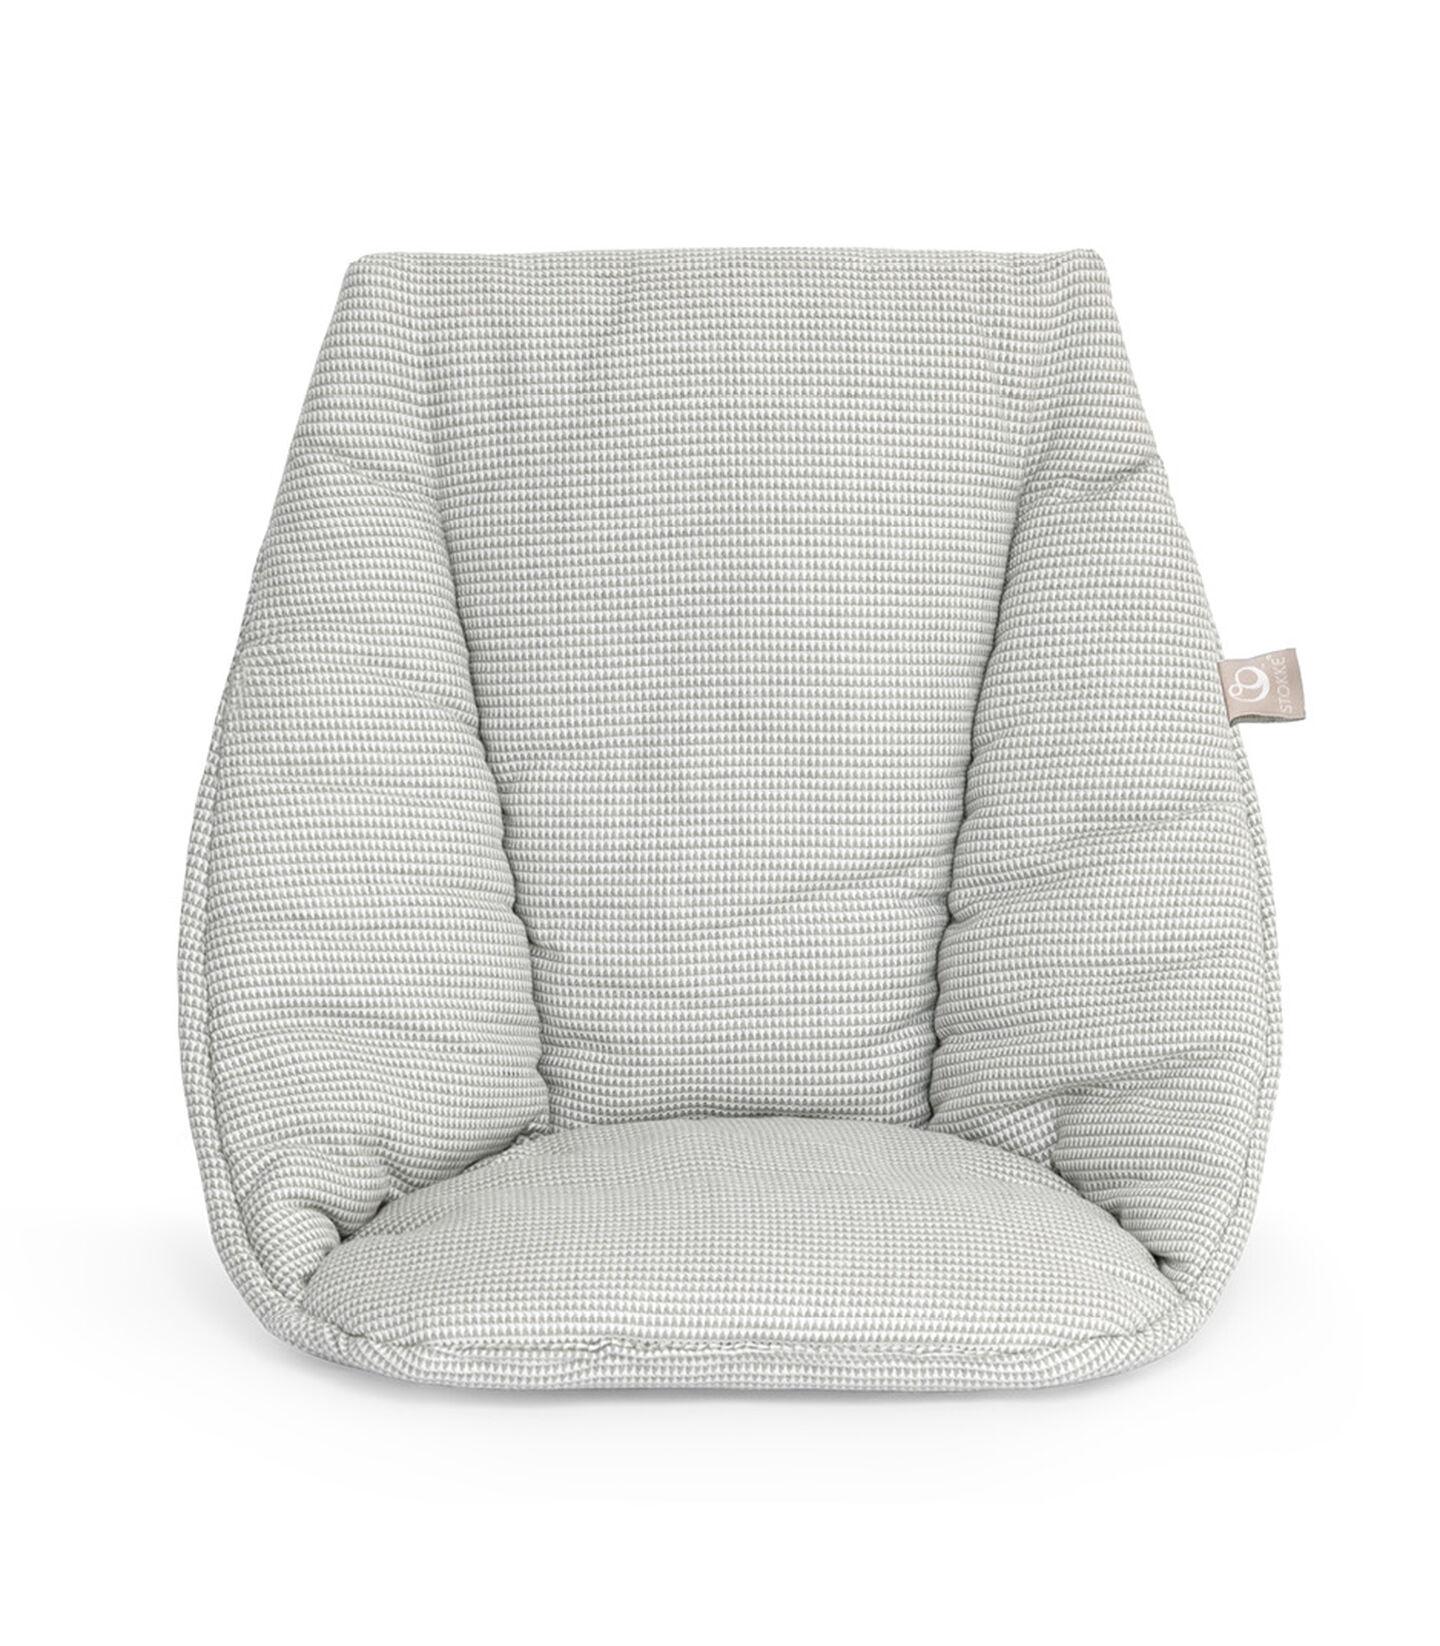 Tripp Trapp® Baby Cushion Nordic Grey. view 2